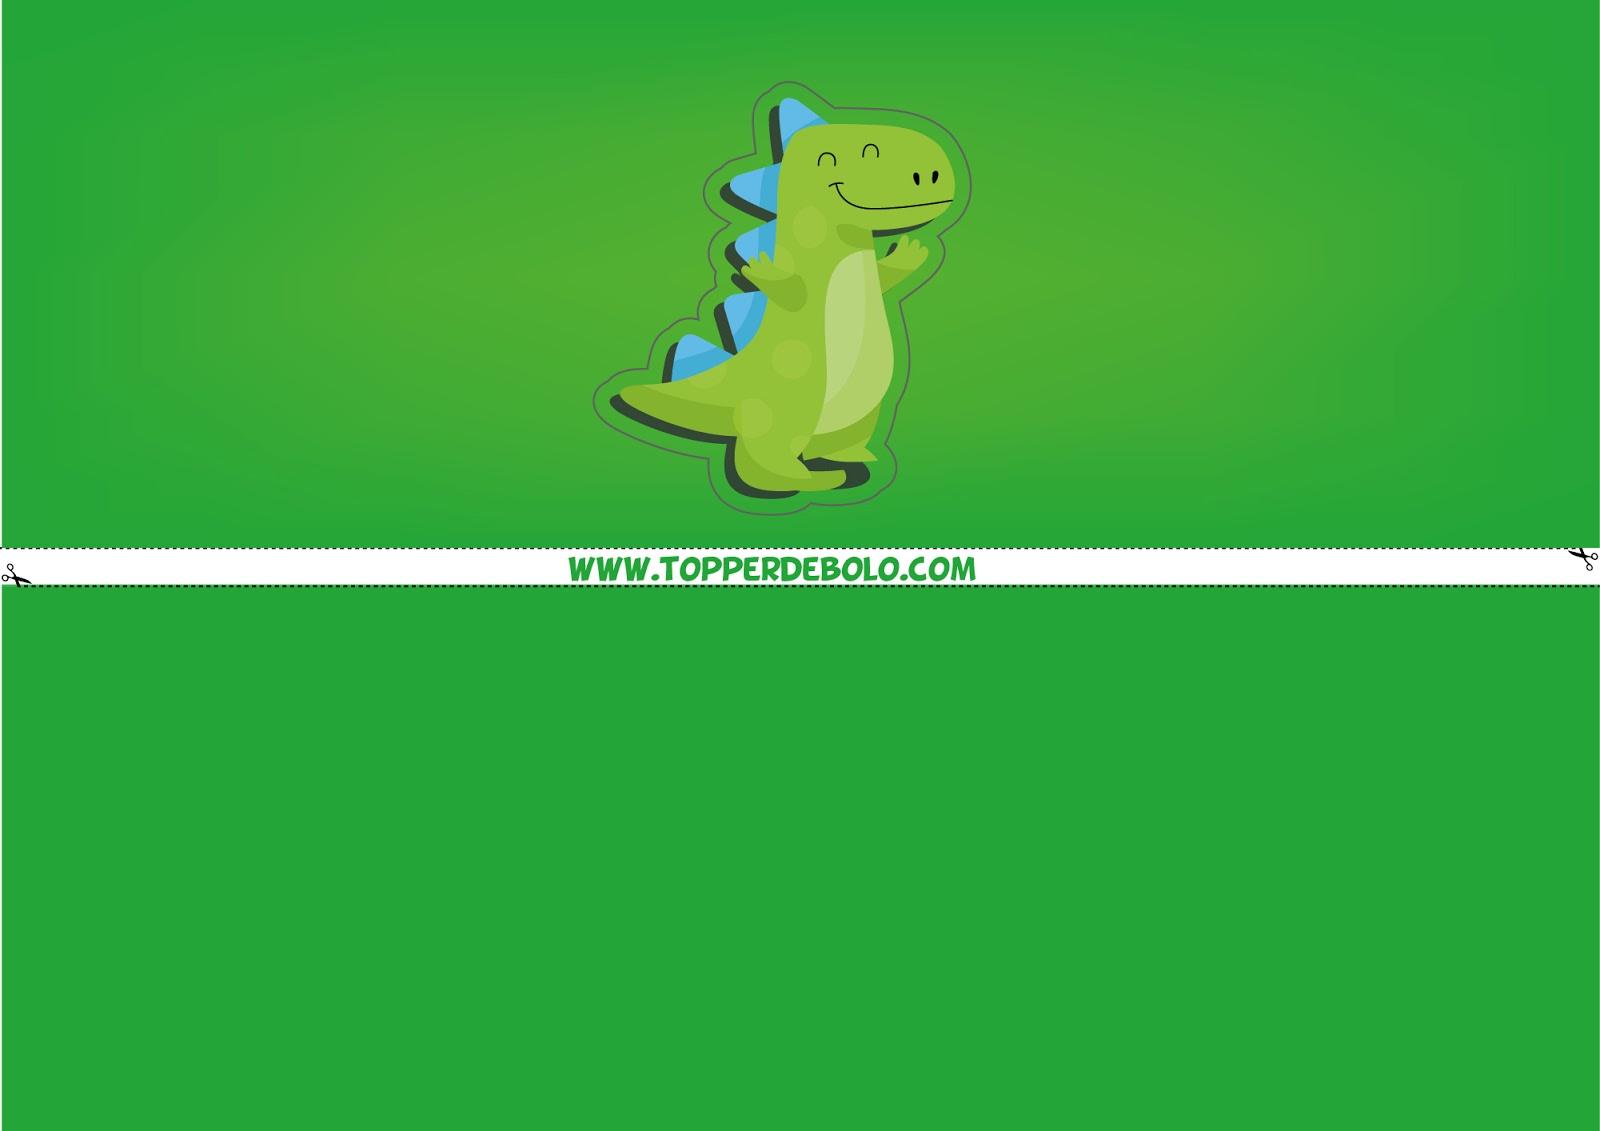 Faixa Lateral Dinossauro Para Imprimir Topper De Bolo Para Imprimir